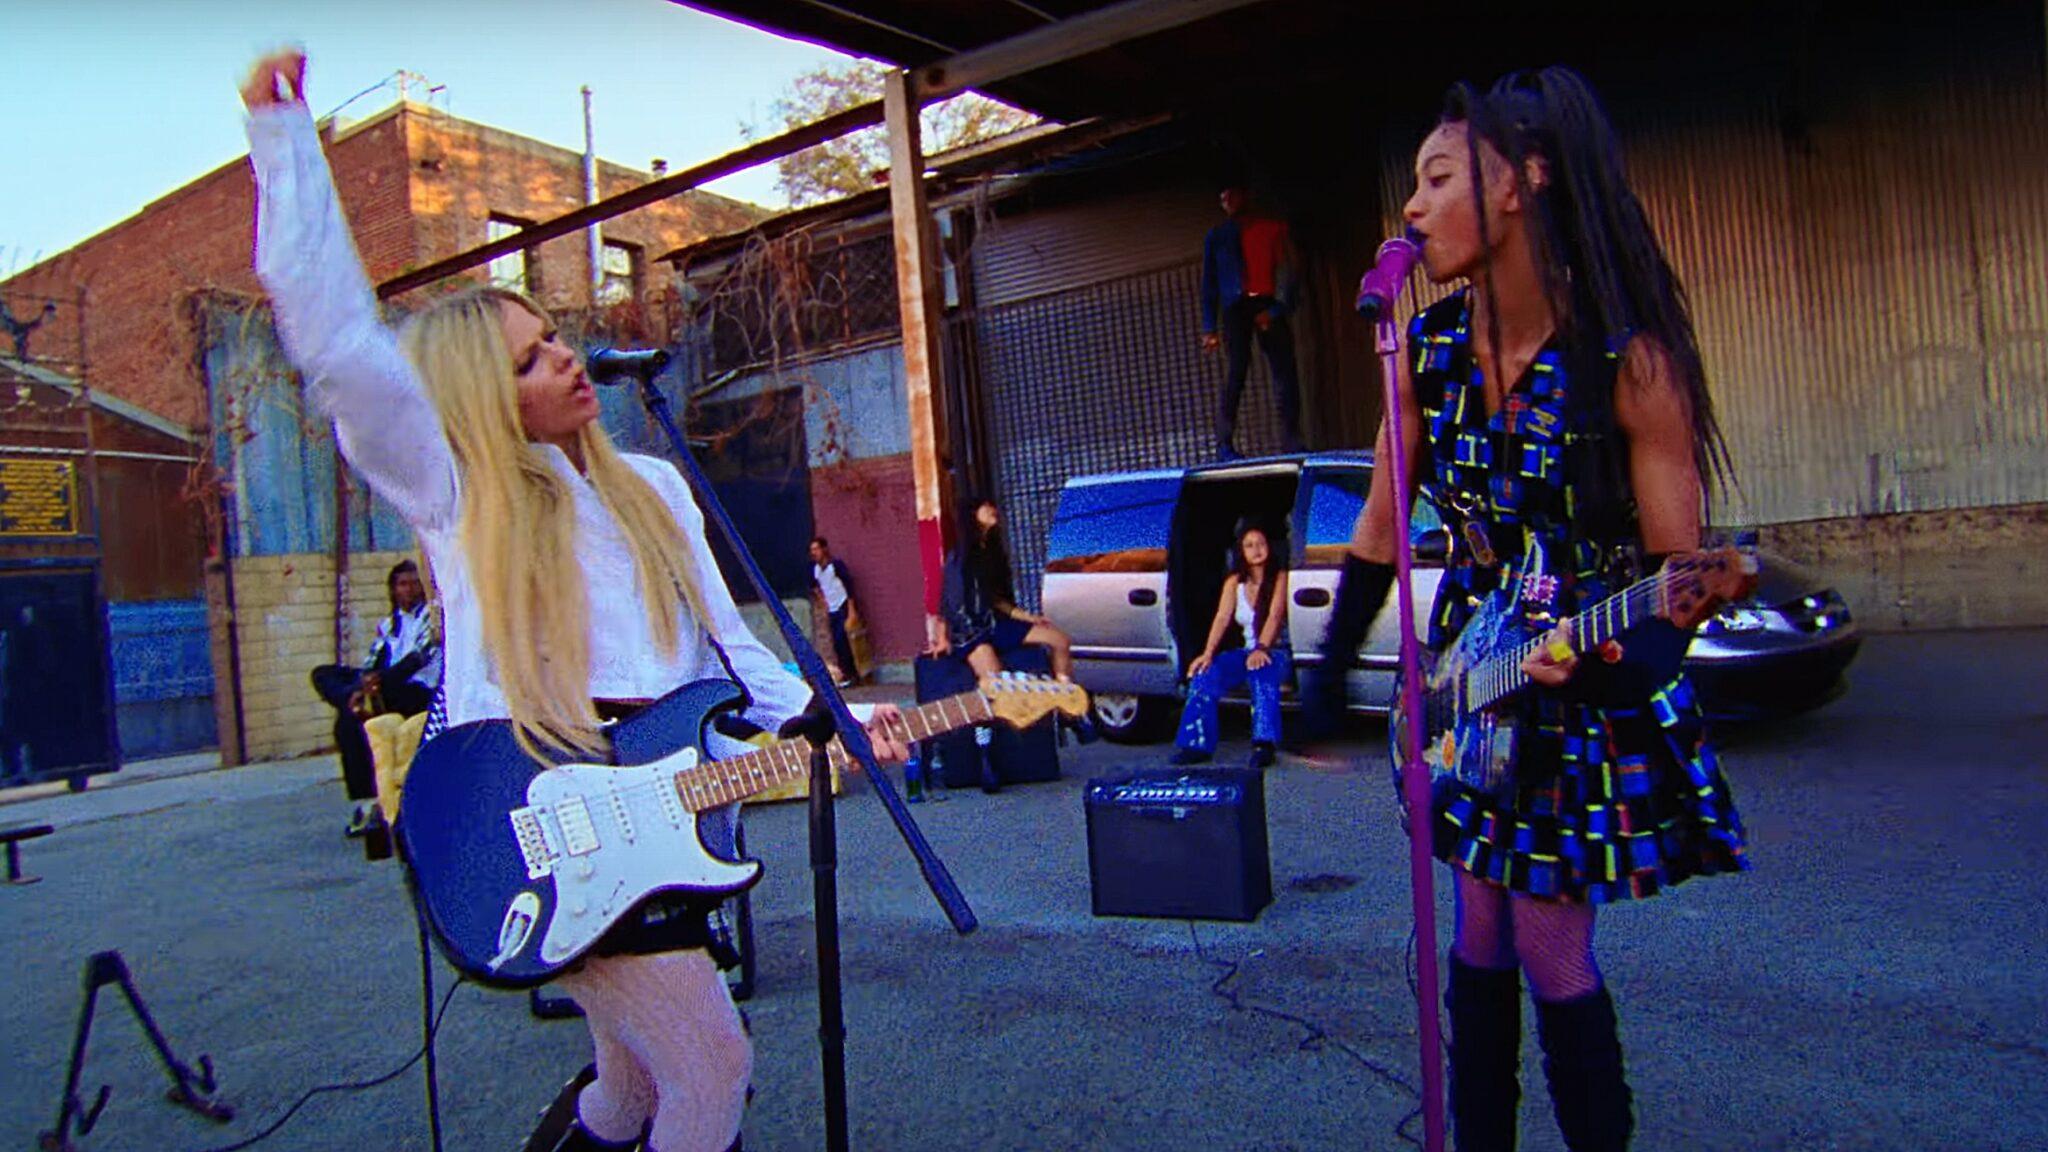 Willow Smith Avril Lavigne Travis Barker Blink-182